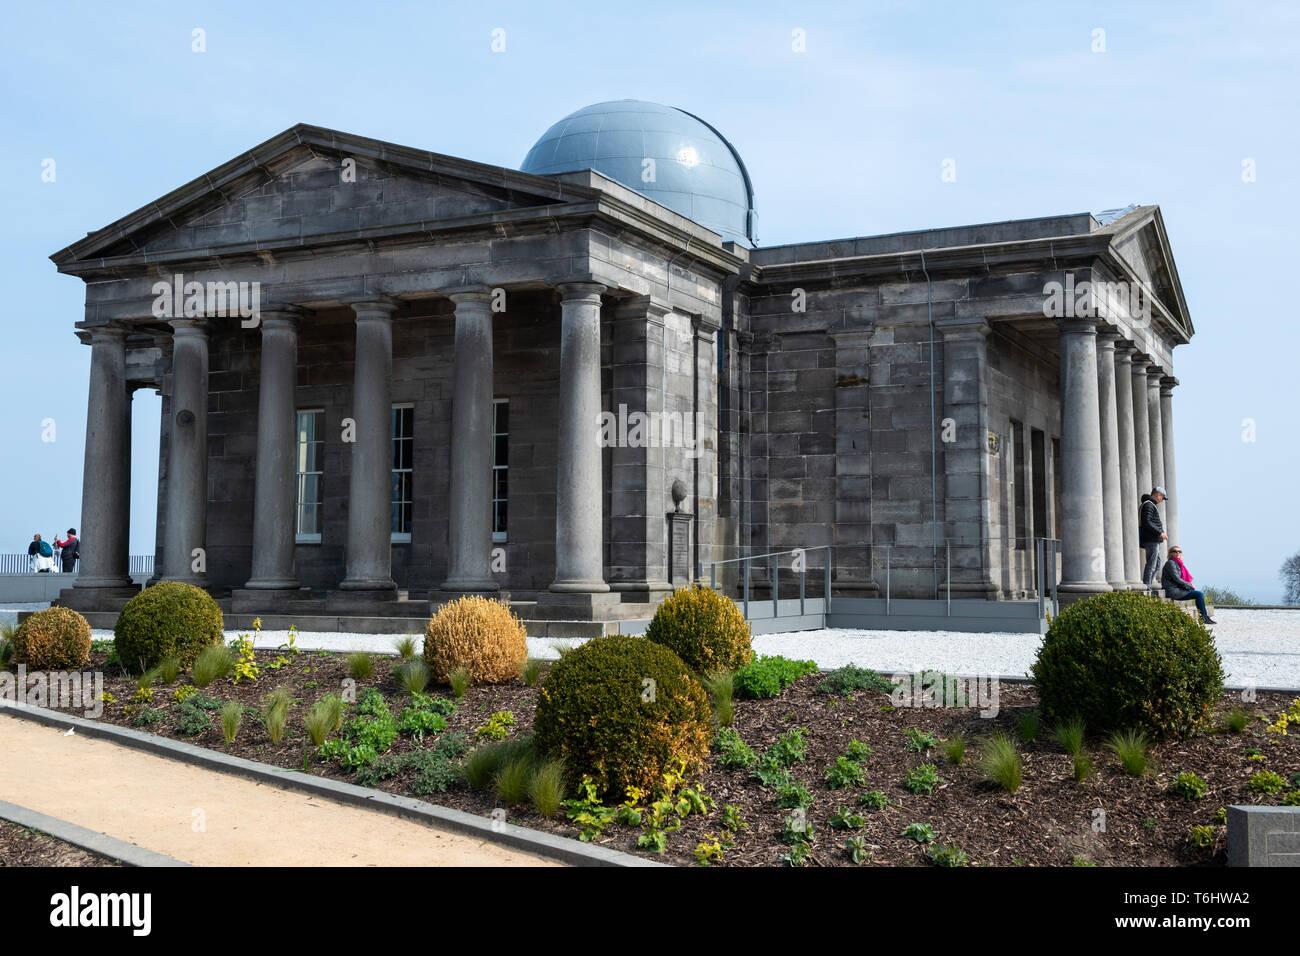 Restored City Observatory, now the Collective Arts Centre, on Calton Hill, Edinburgh, Scotland, UK Stock Photo